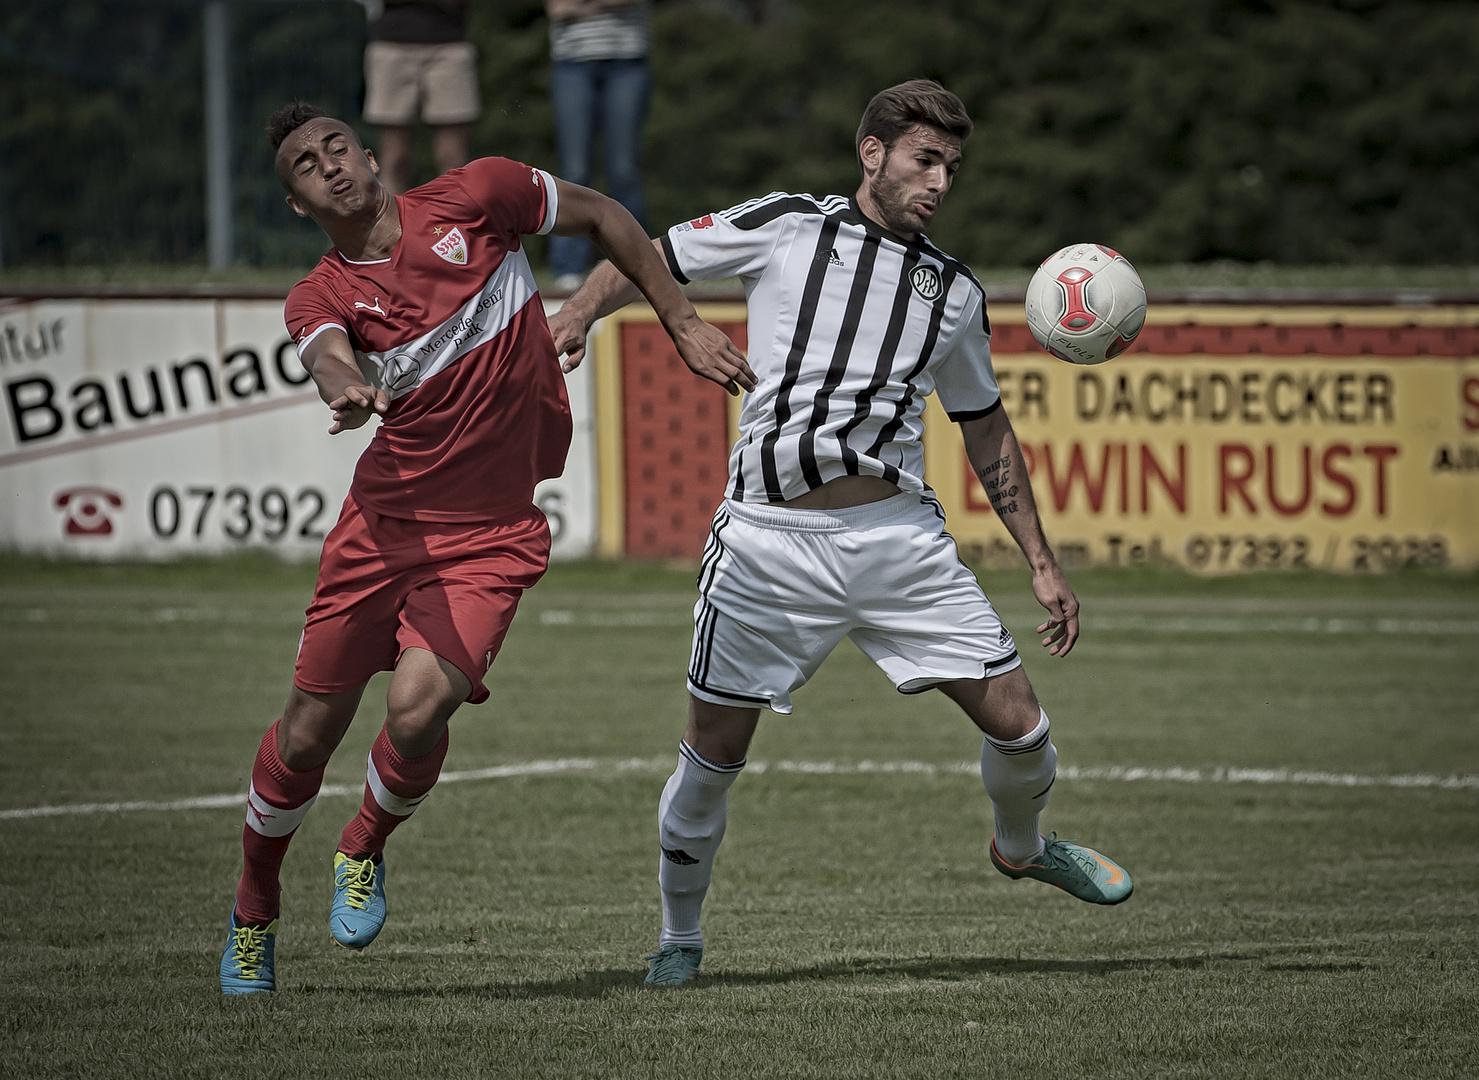 VfR Aalen - VfB Stuttgart II in Laupheim: 2:0